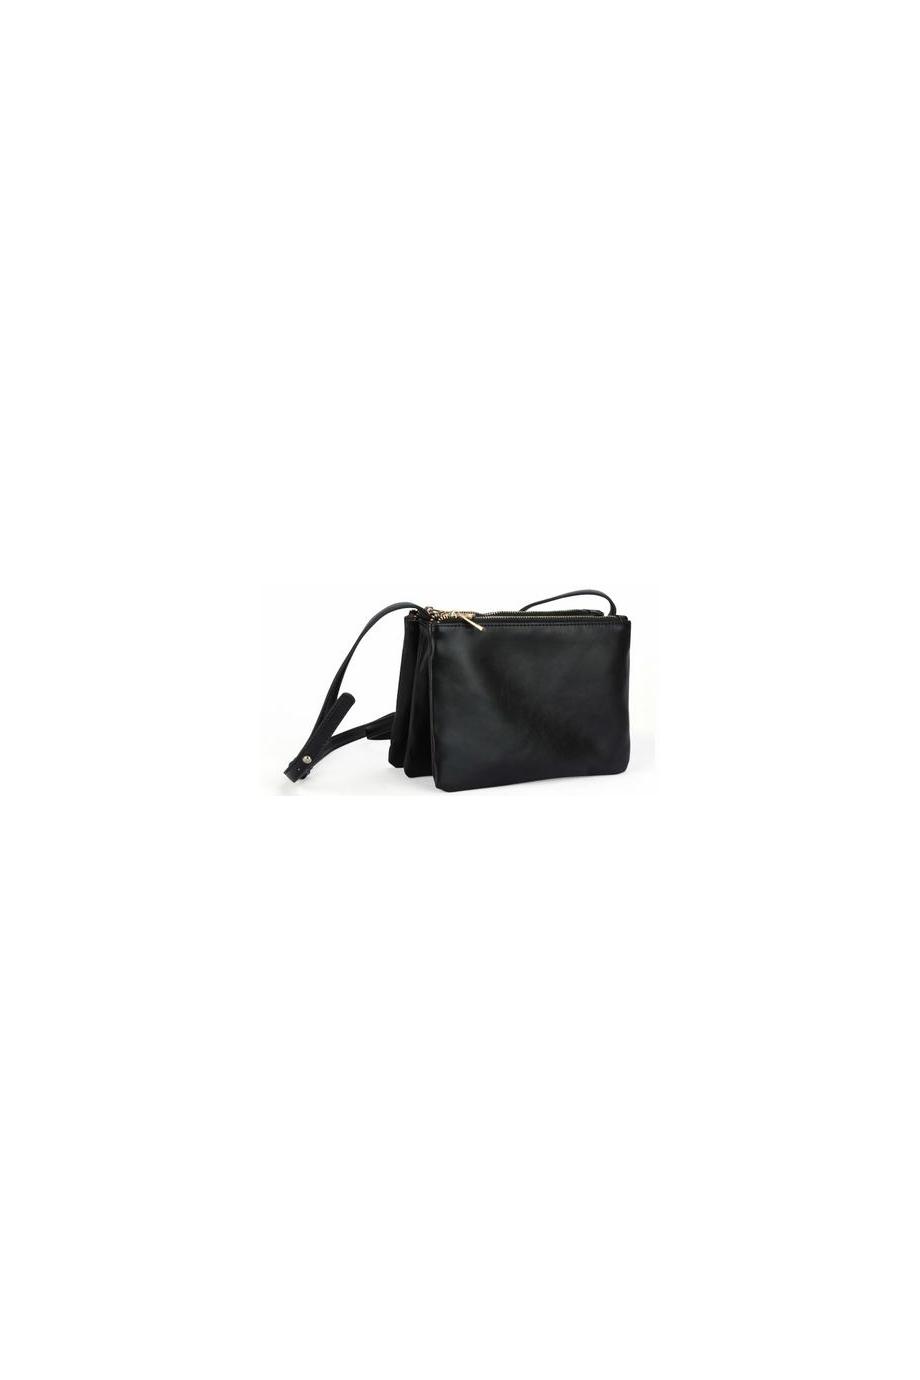 AZUKA Multifunctional Clutch Bag Buy Street Fashion | Online Store AZUKA Multifunctional Clutch Bag Black | Runway Bag - Jessica Buurman [2496] - $55.00 : JESSICABUURMAN.COM